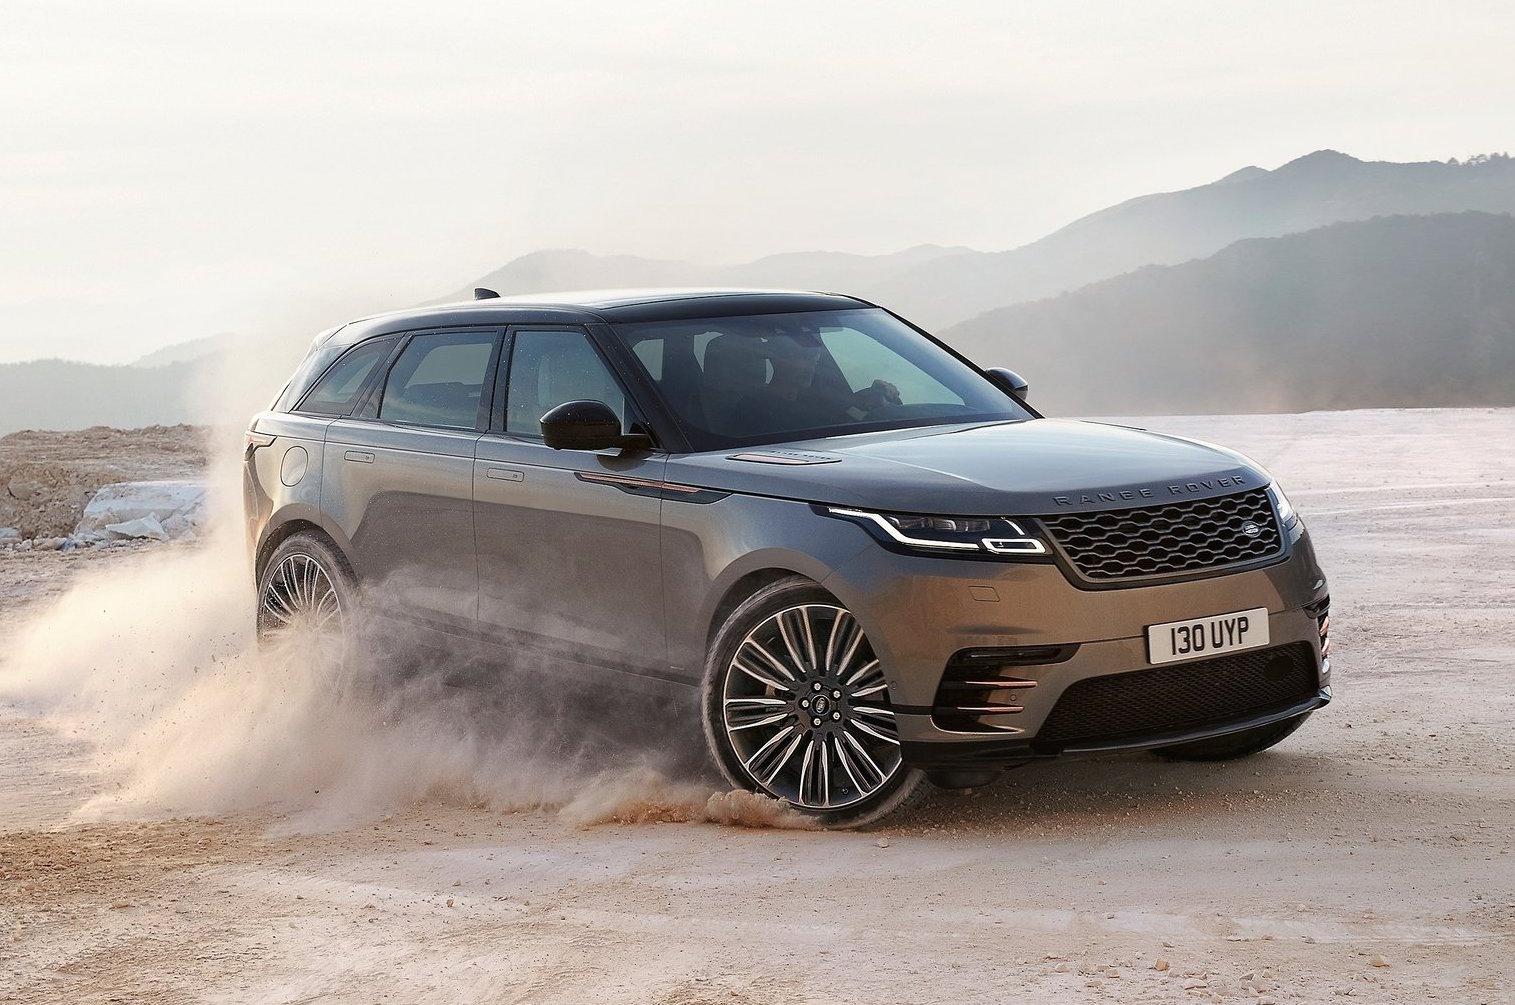 Range Rover Velar unveiled, to go on sale in Australia from $70,300 | PerformanceDrive